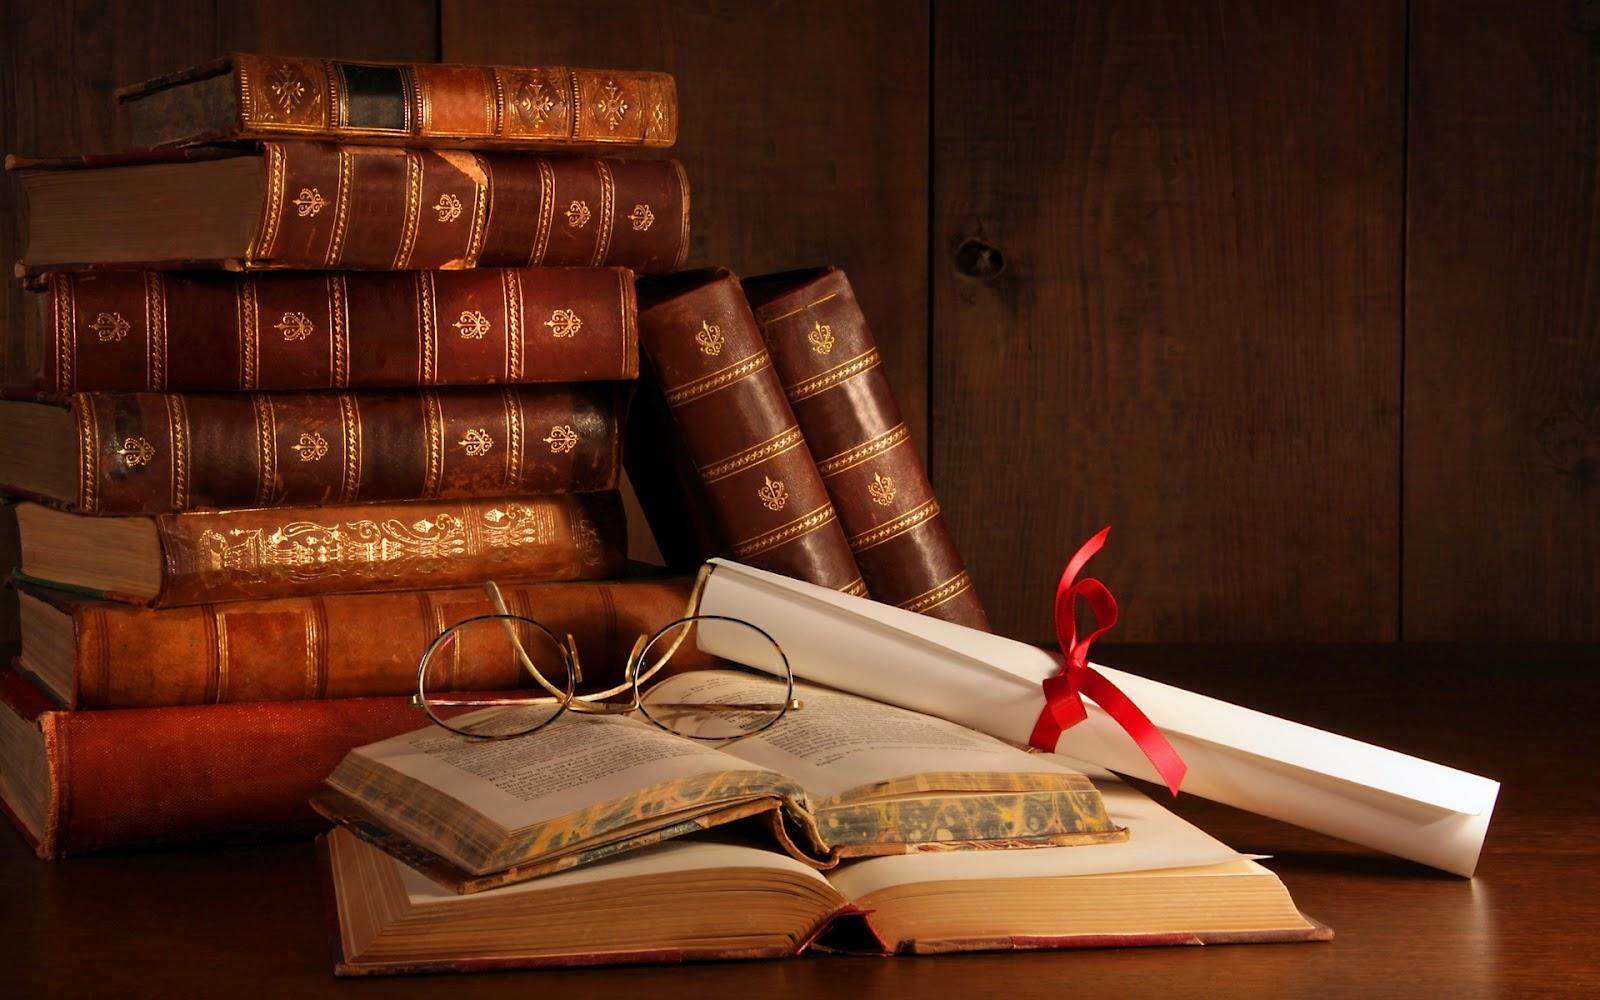 Libros Viejos Apilados